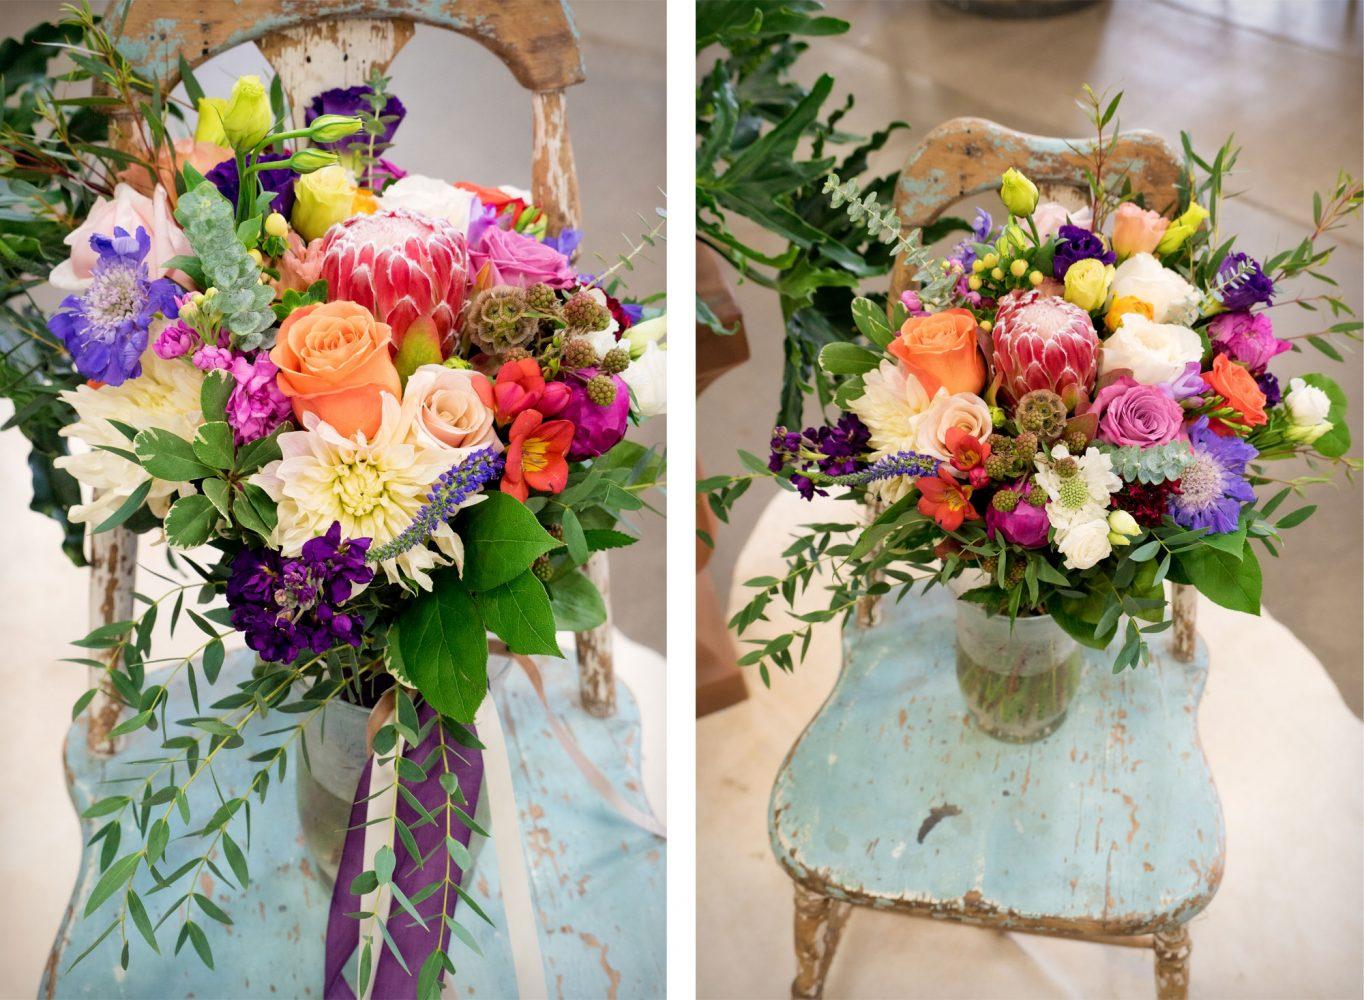 Floral Bouquet & Design by April's Garden at the annual Durango Wedding Expo